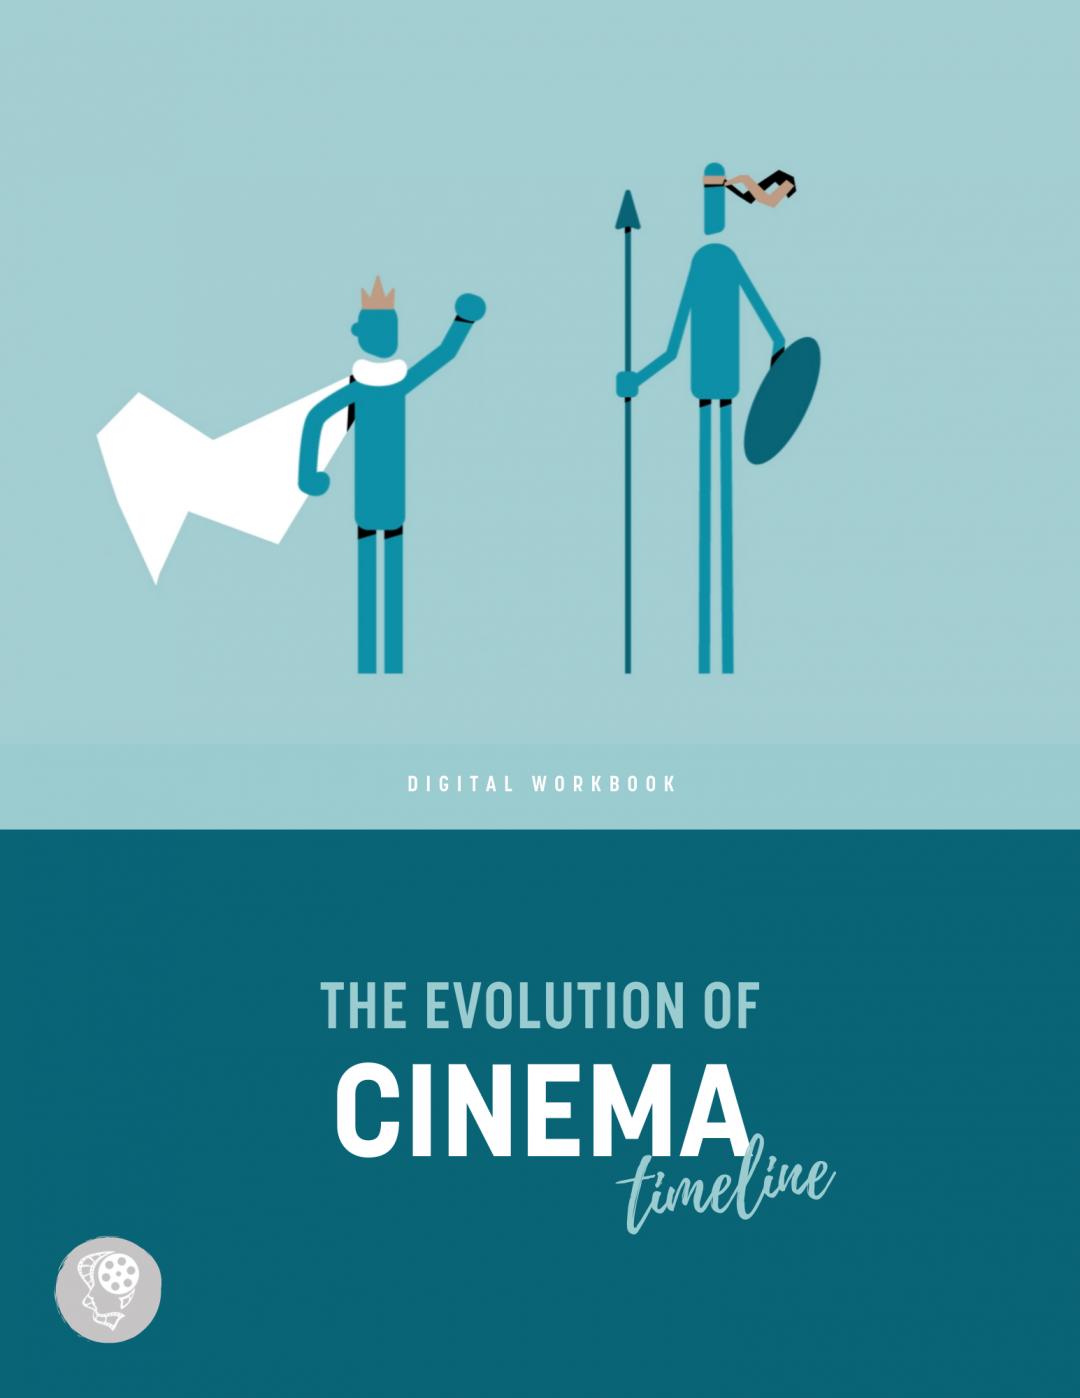 The Evolution of Cinema - Workbook